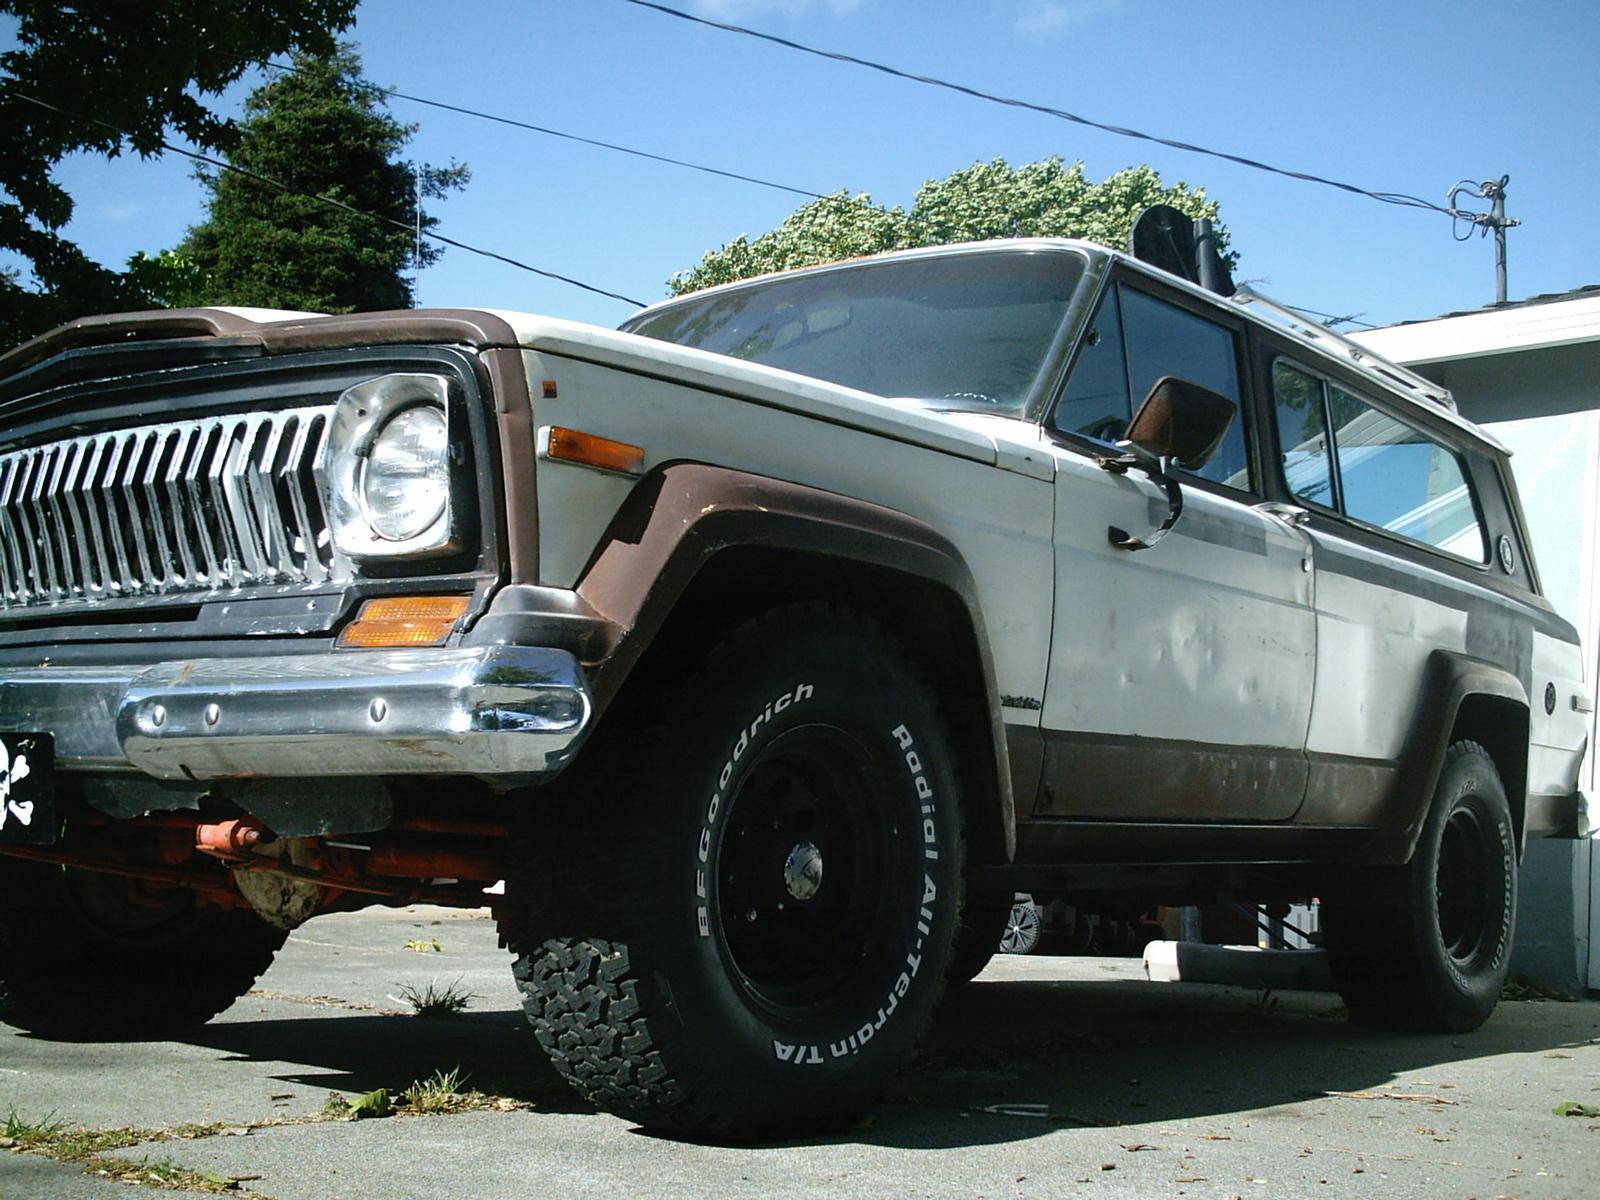 Wagon 1977 1977 Jeep Wagoneer Overview